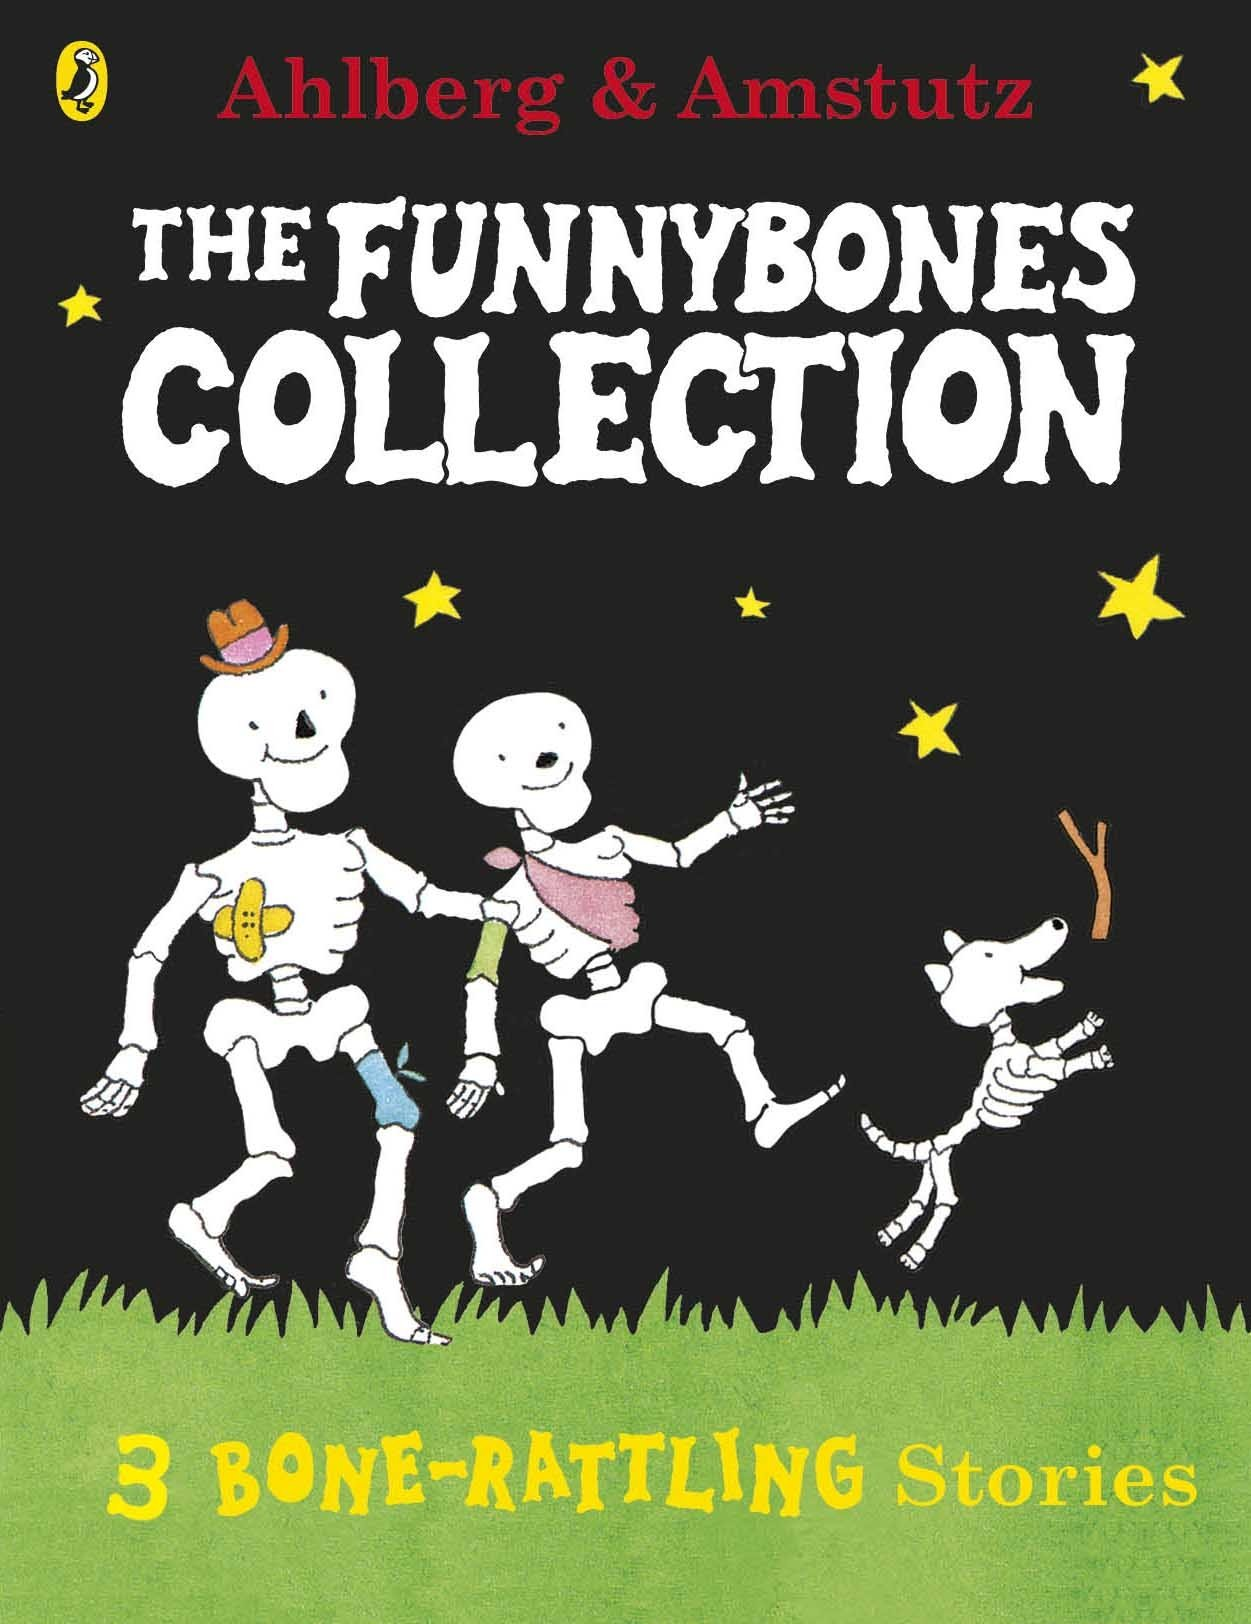 Funnybones: A Bone Rattling Collection: Amazon.co.uk: Ahlberg, Allan,  Amstutz, Andre: 9780141333571: Books